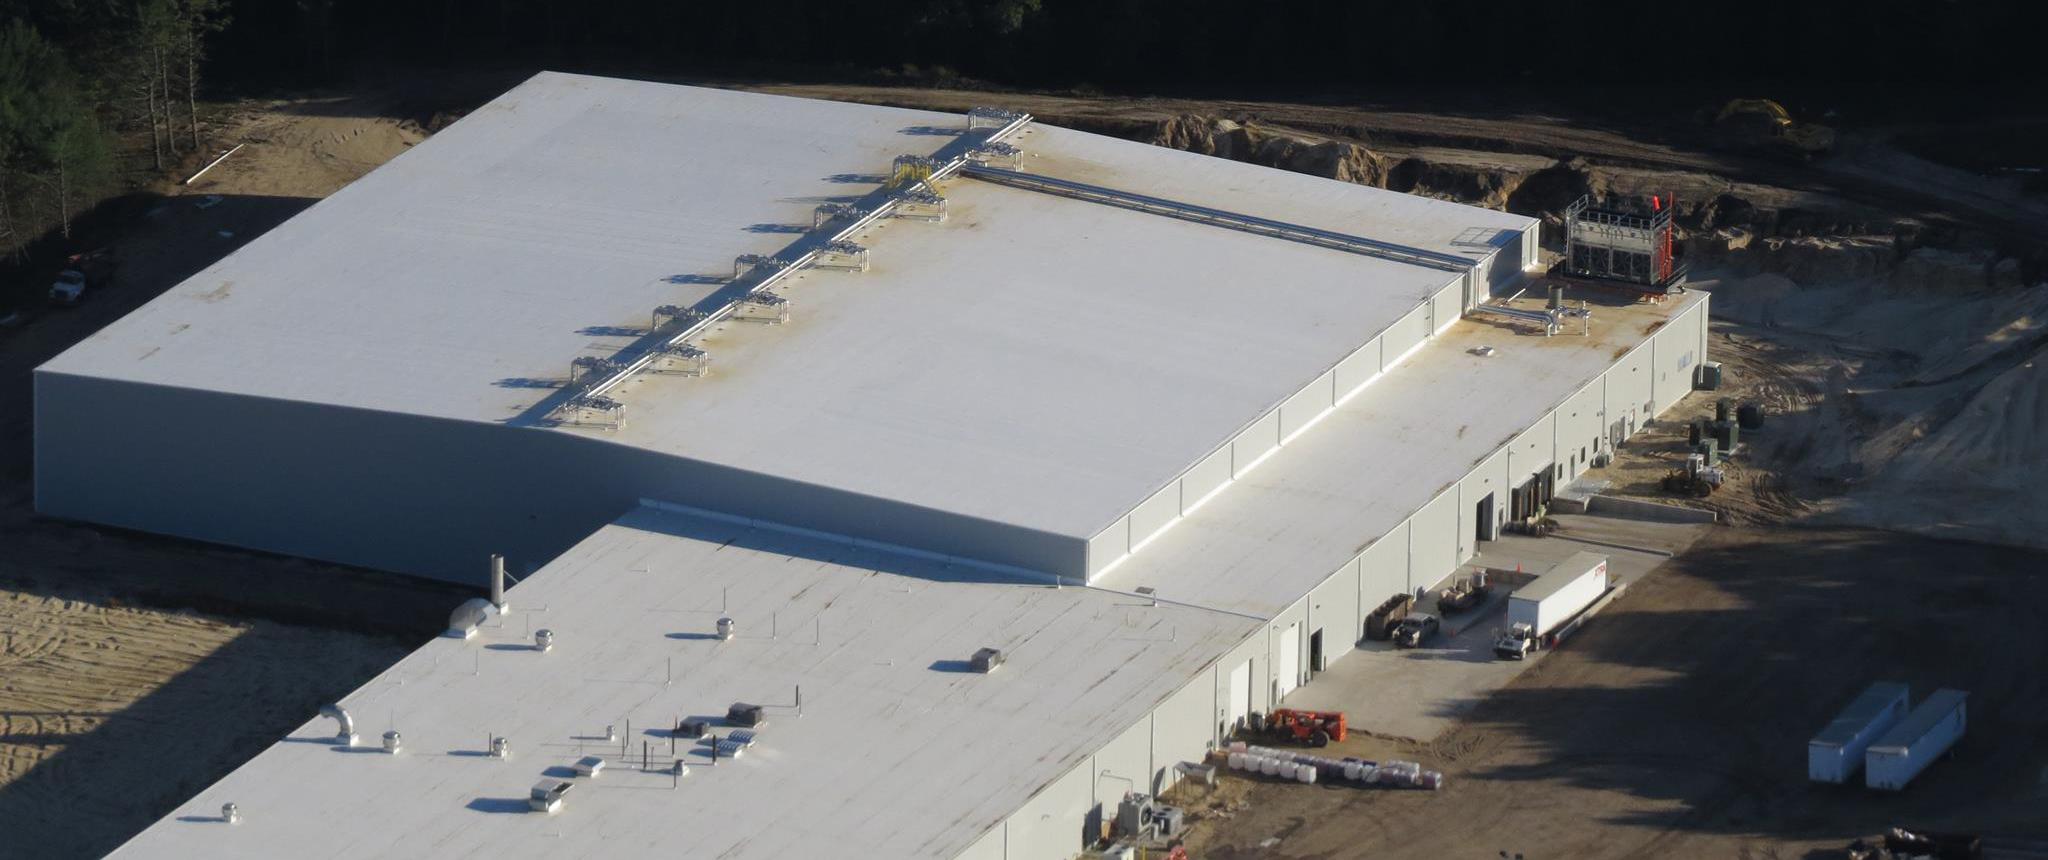 Warrens Cold Storage in Warrens, Wisconsin